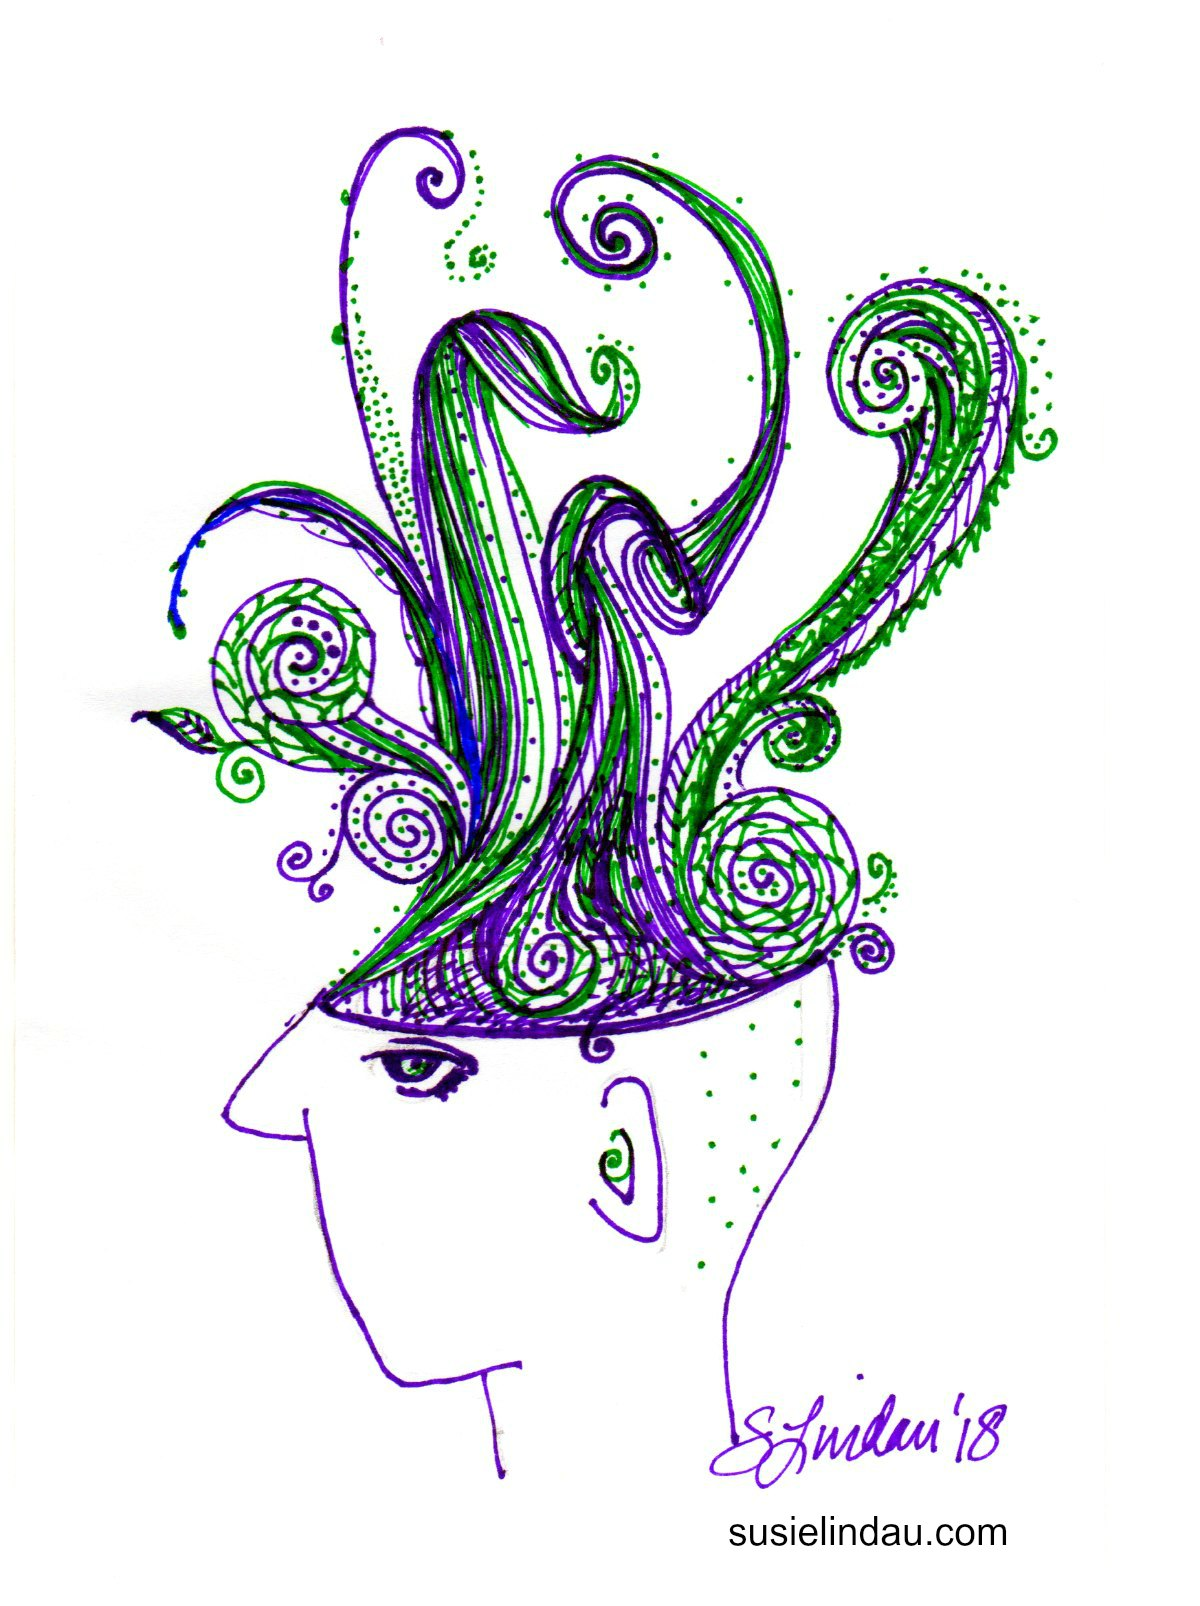 An illustration of my brain on inspiration.